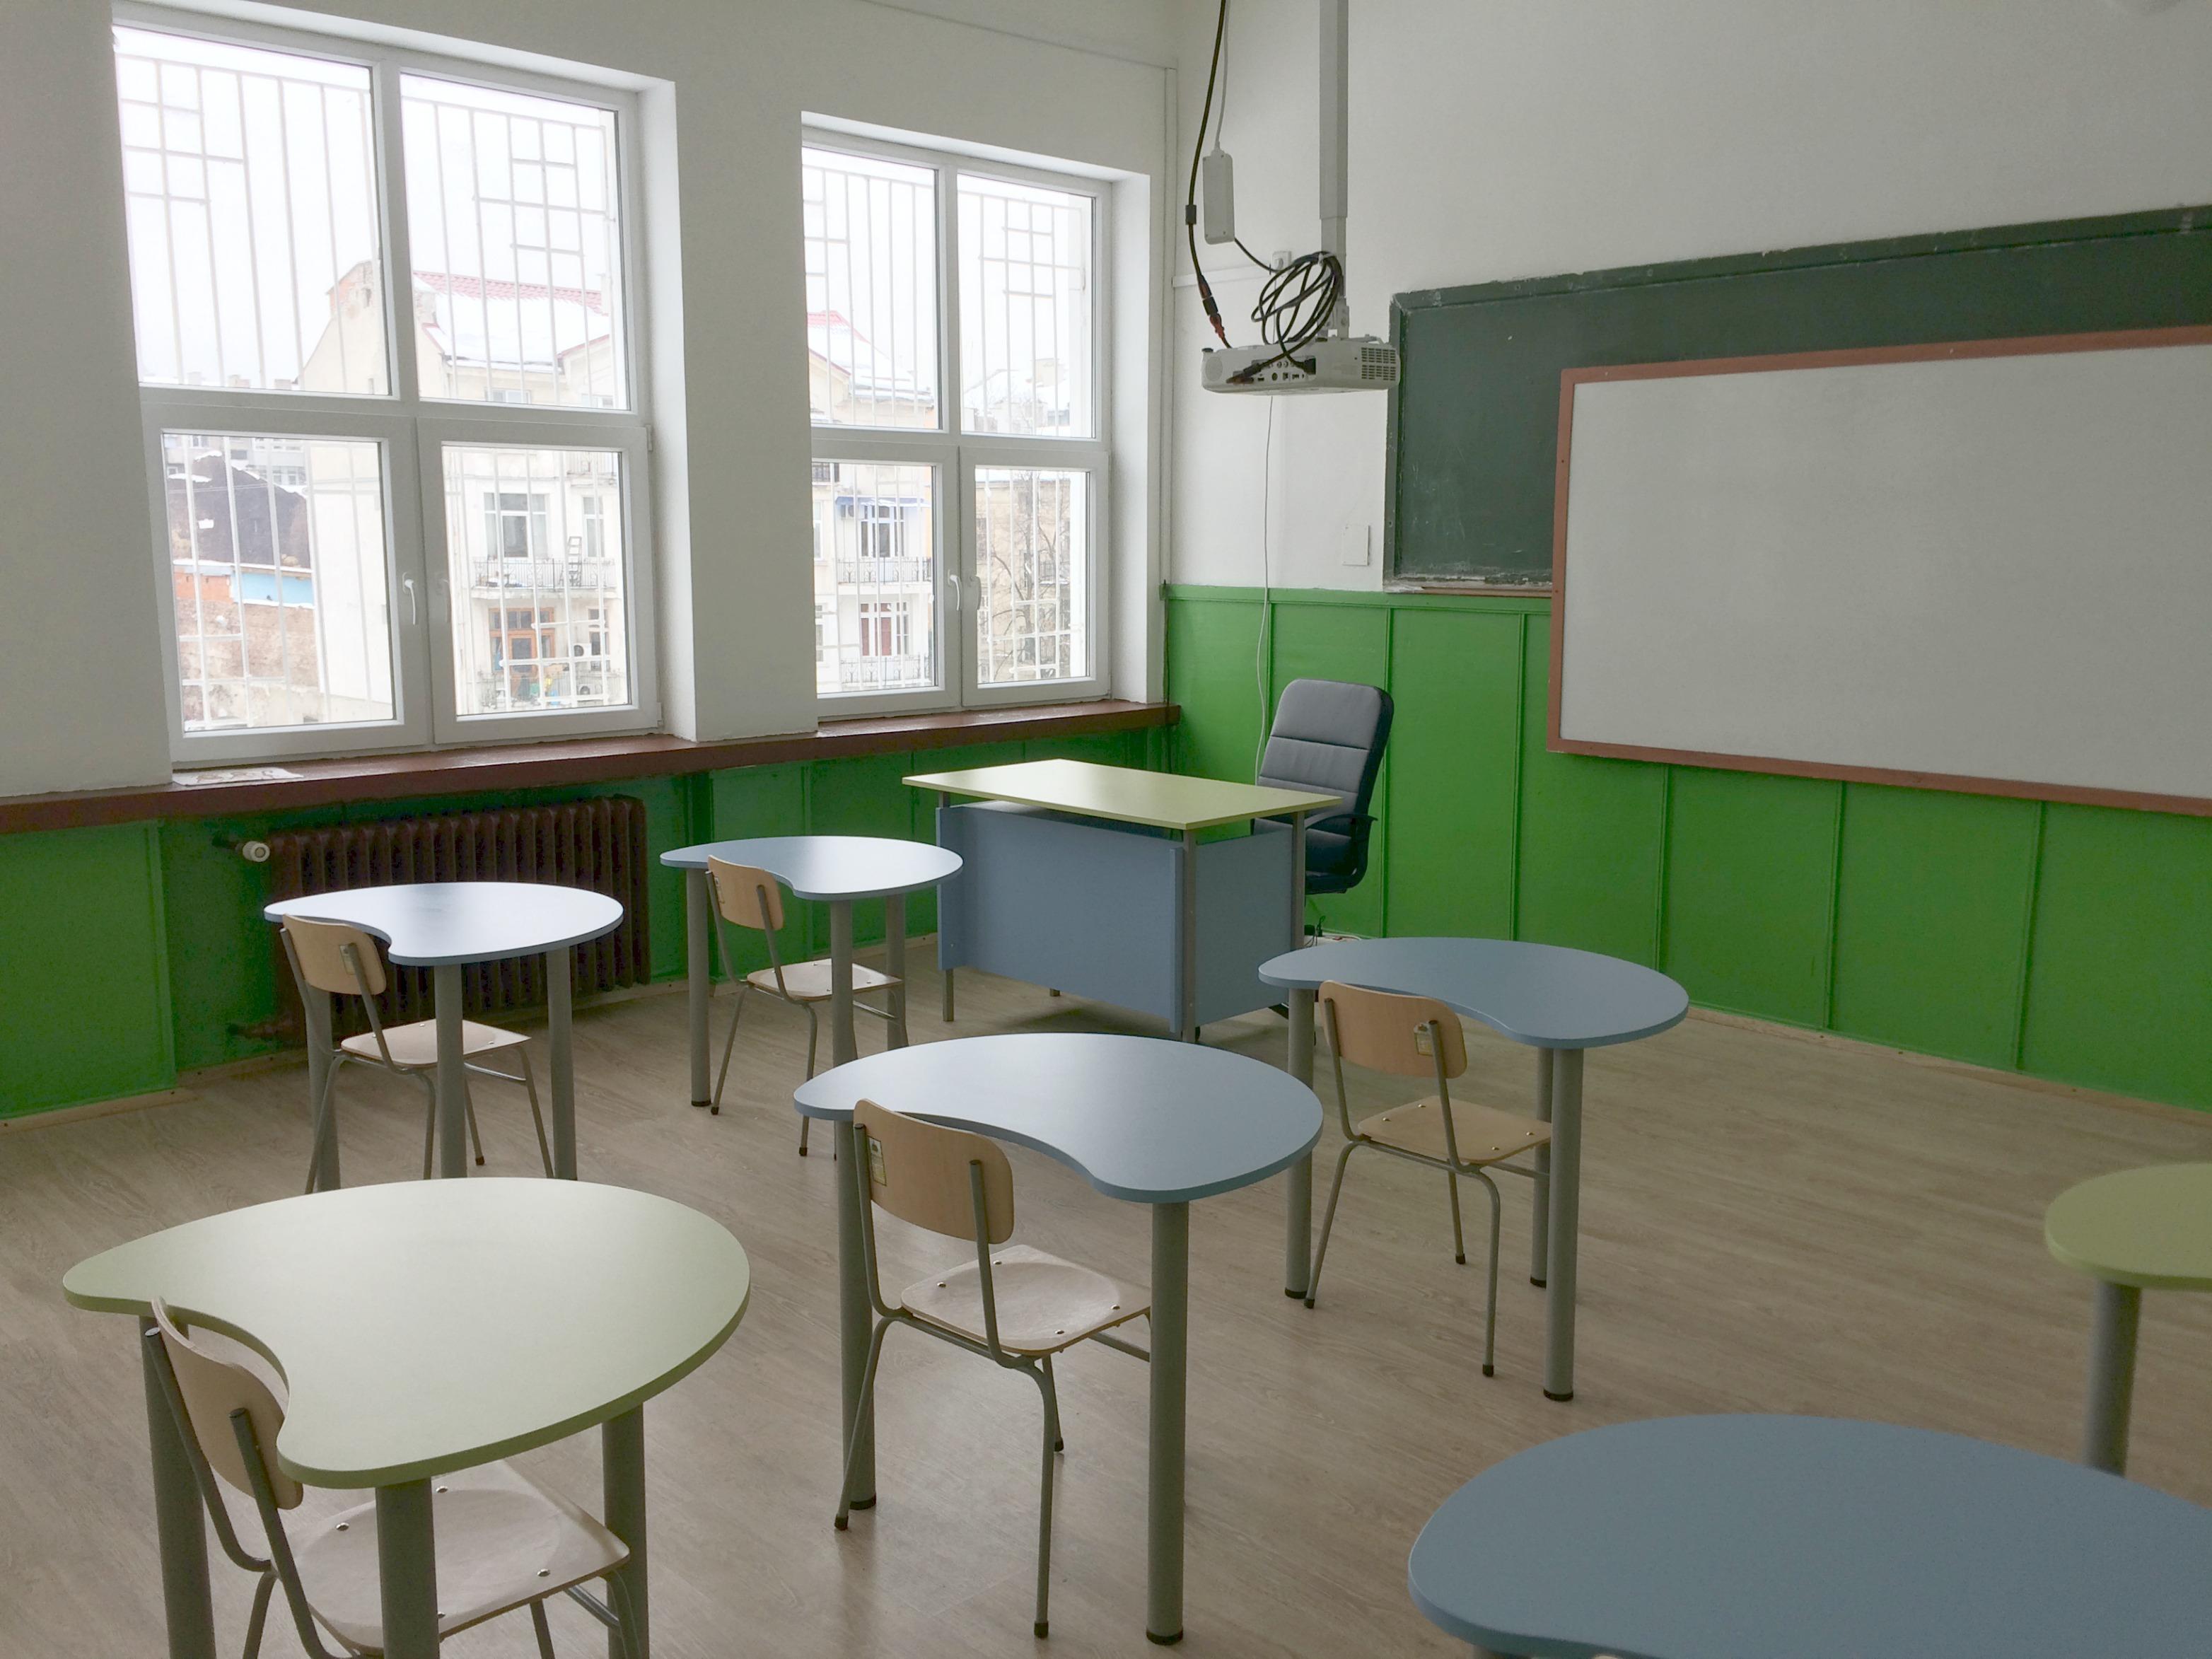 Colegio_Español_Reina_Sofía_Bulgaria_3